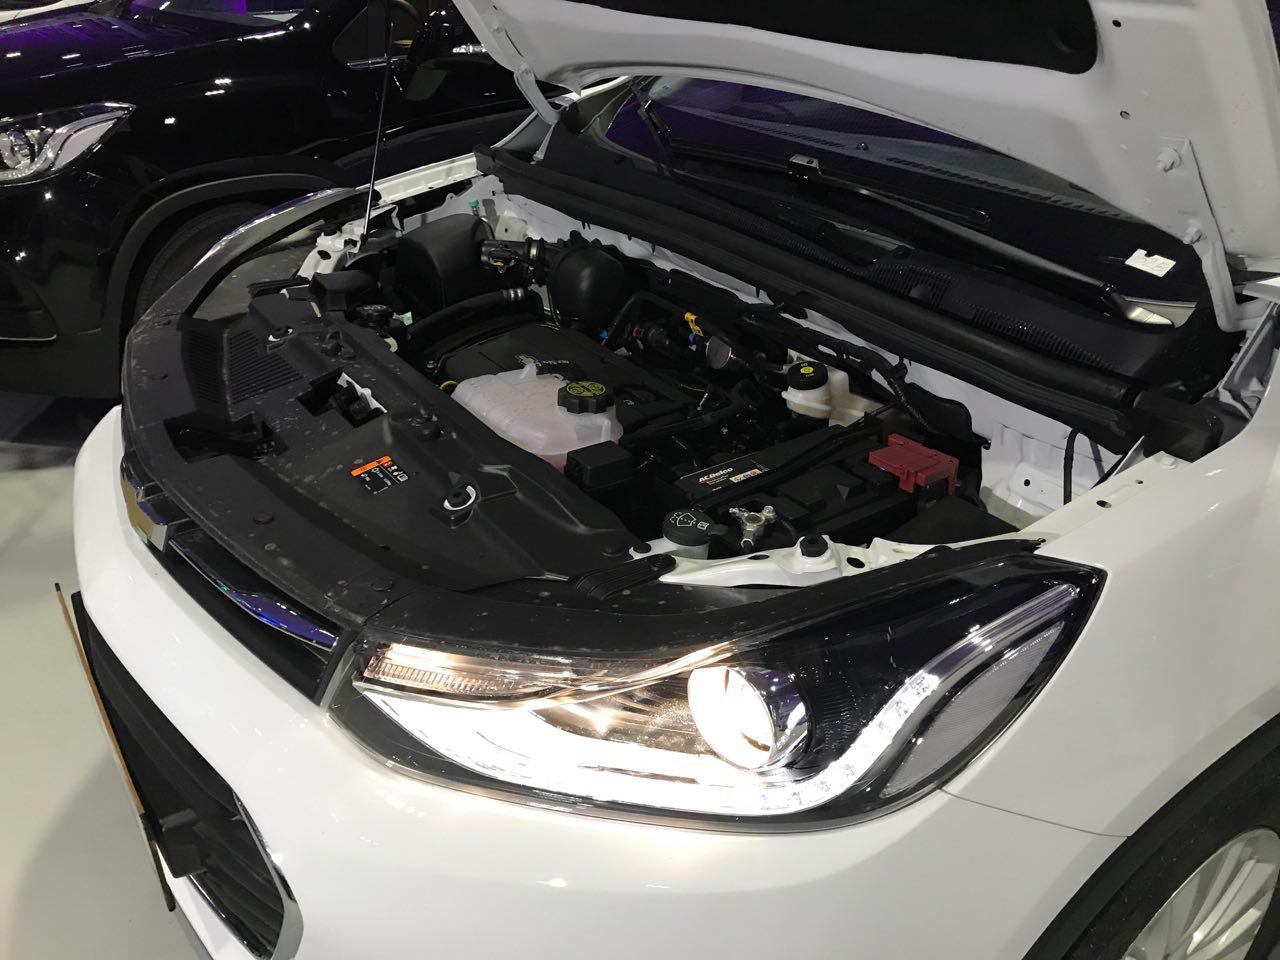 Двигатель Chevrolet Tracker (Trax) Мотор Шевроле Треккер - 1,8 литра от Chevrolet Orlando